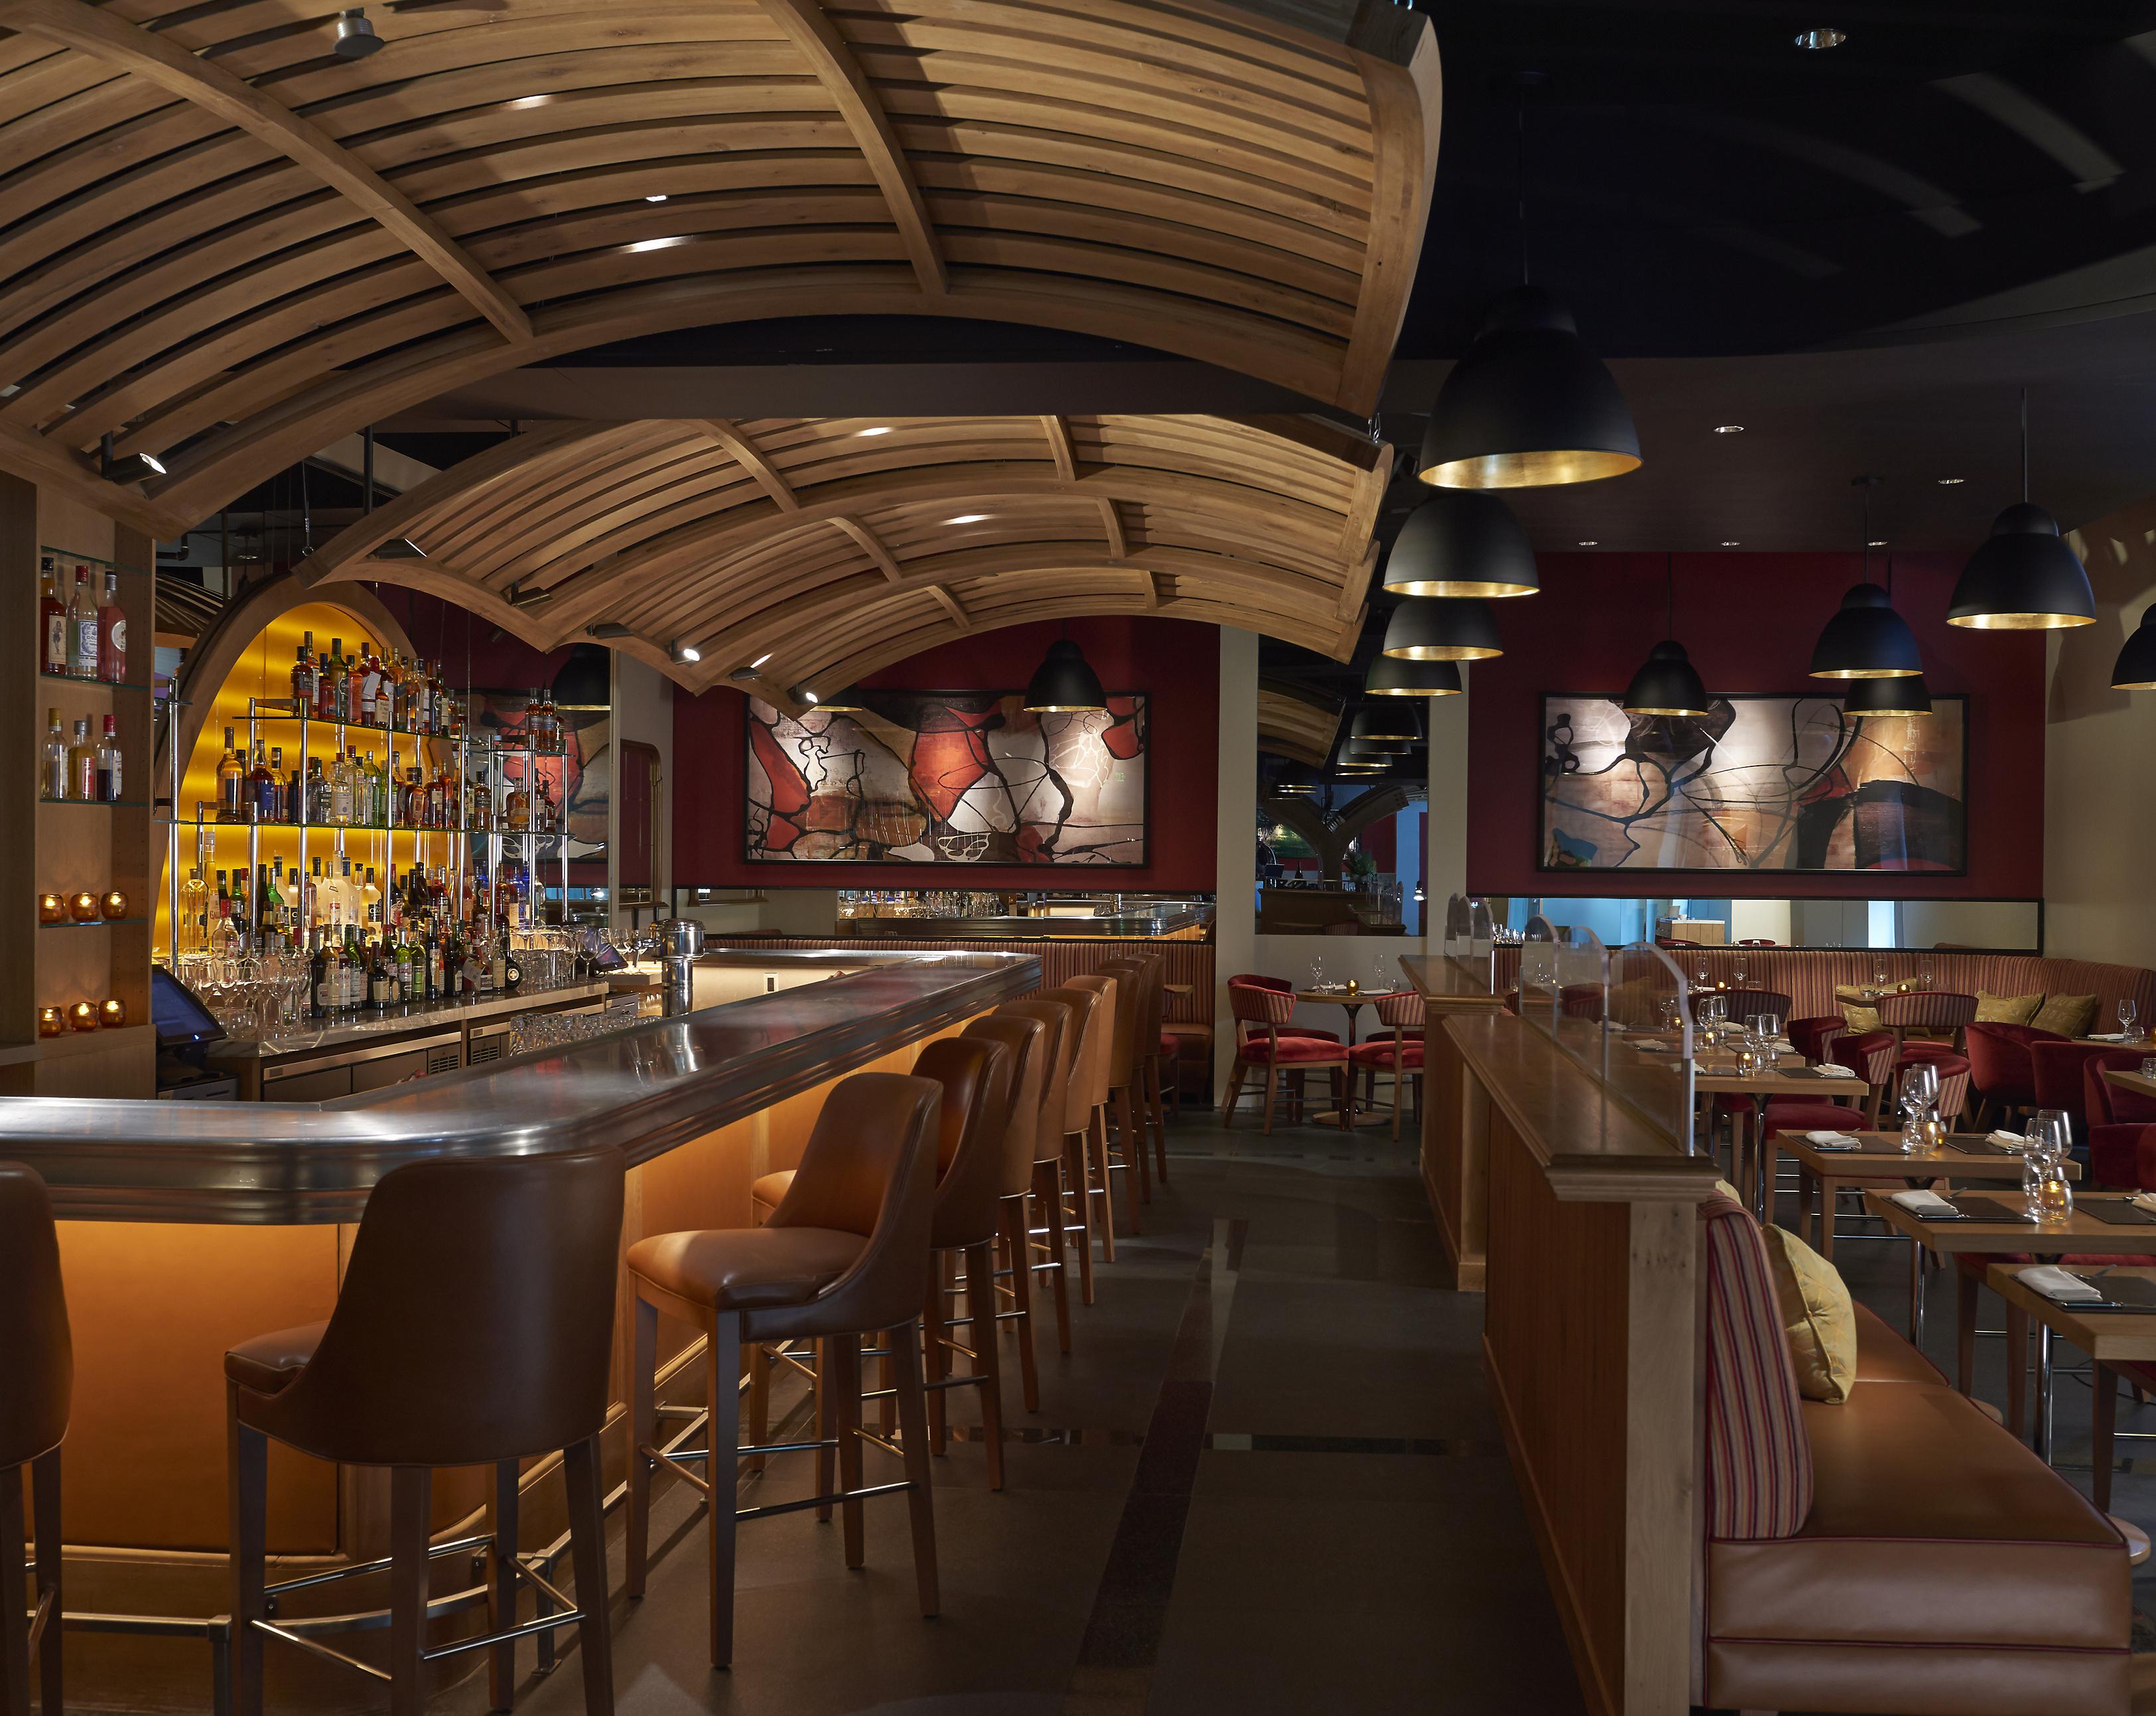 boston-2014-fine-dining-bar-boulud-bar-01